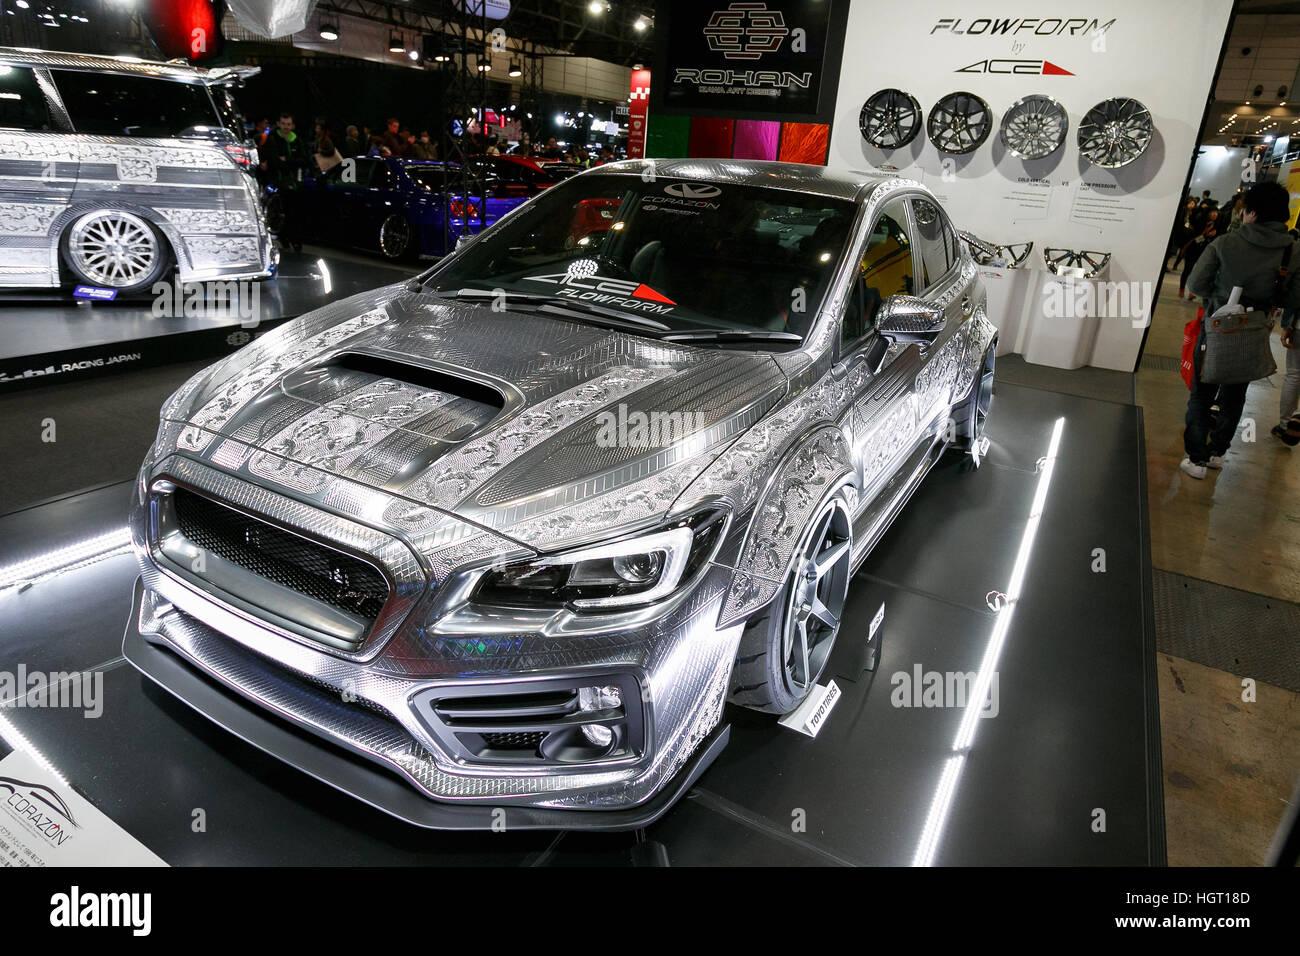 Subaru Wrx Custom >> Tokyo Japan 13th Jan 2017 A Customized Subaru Wrx Sti On Display